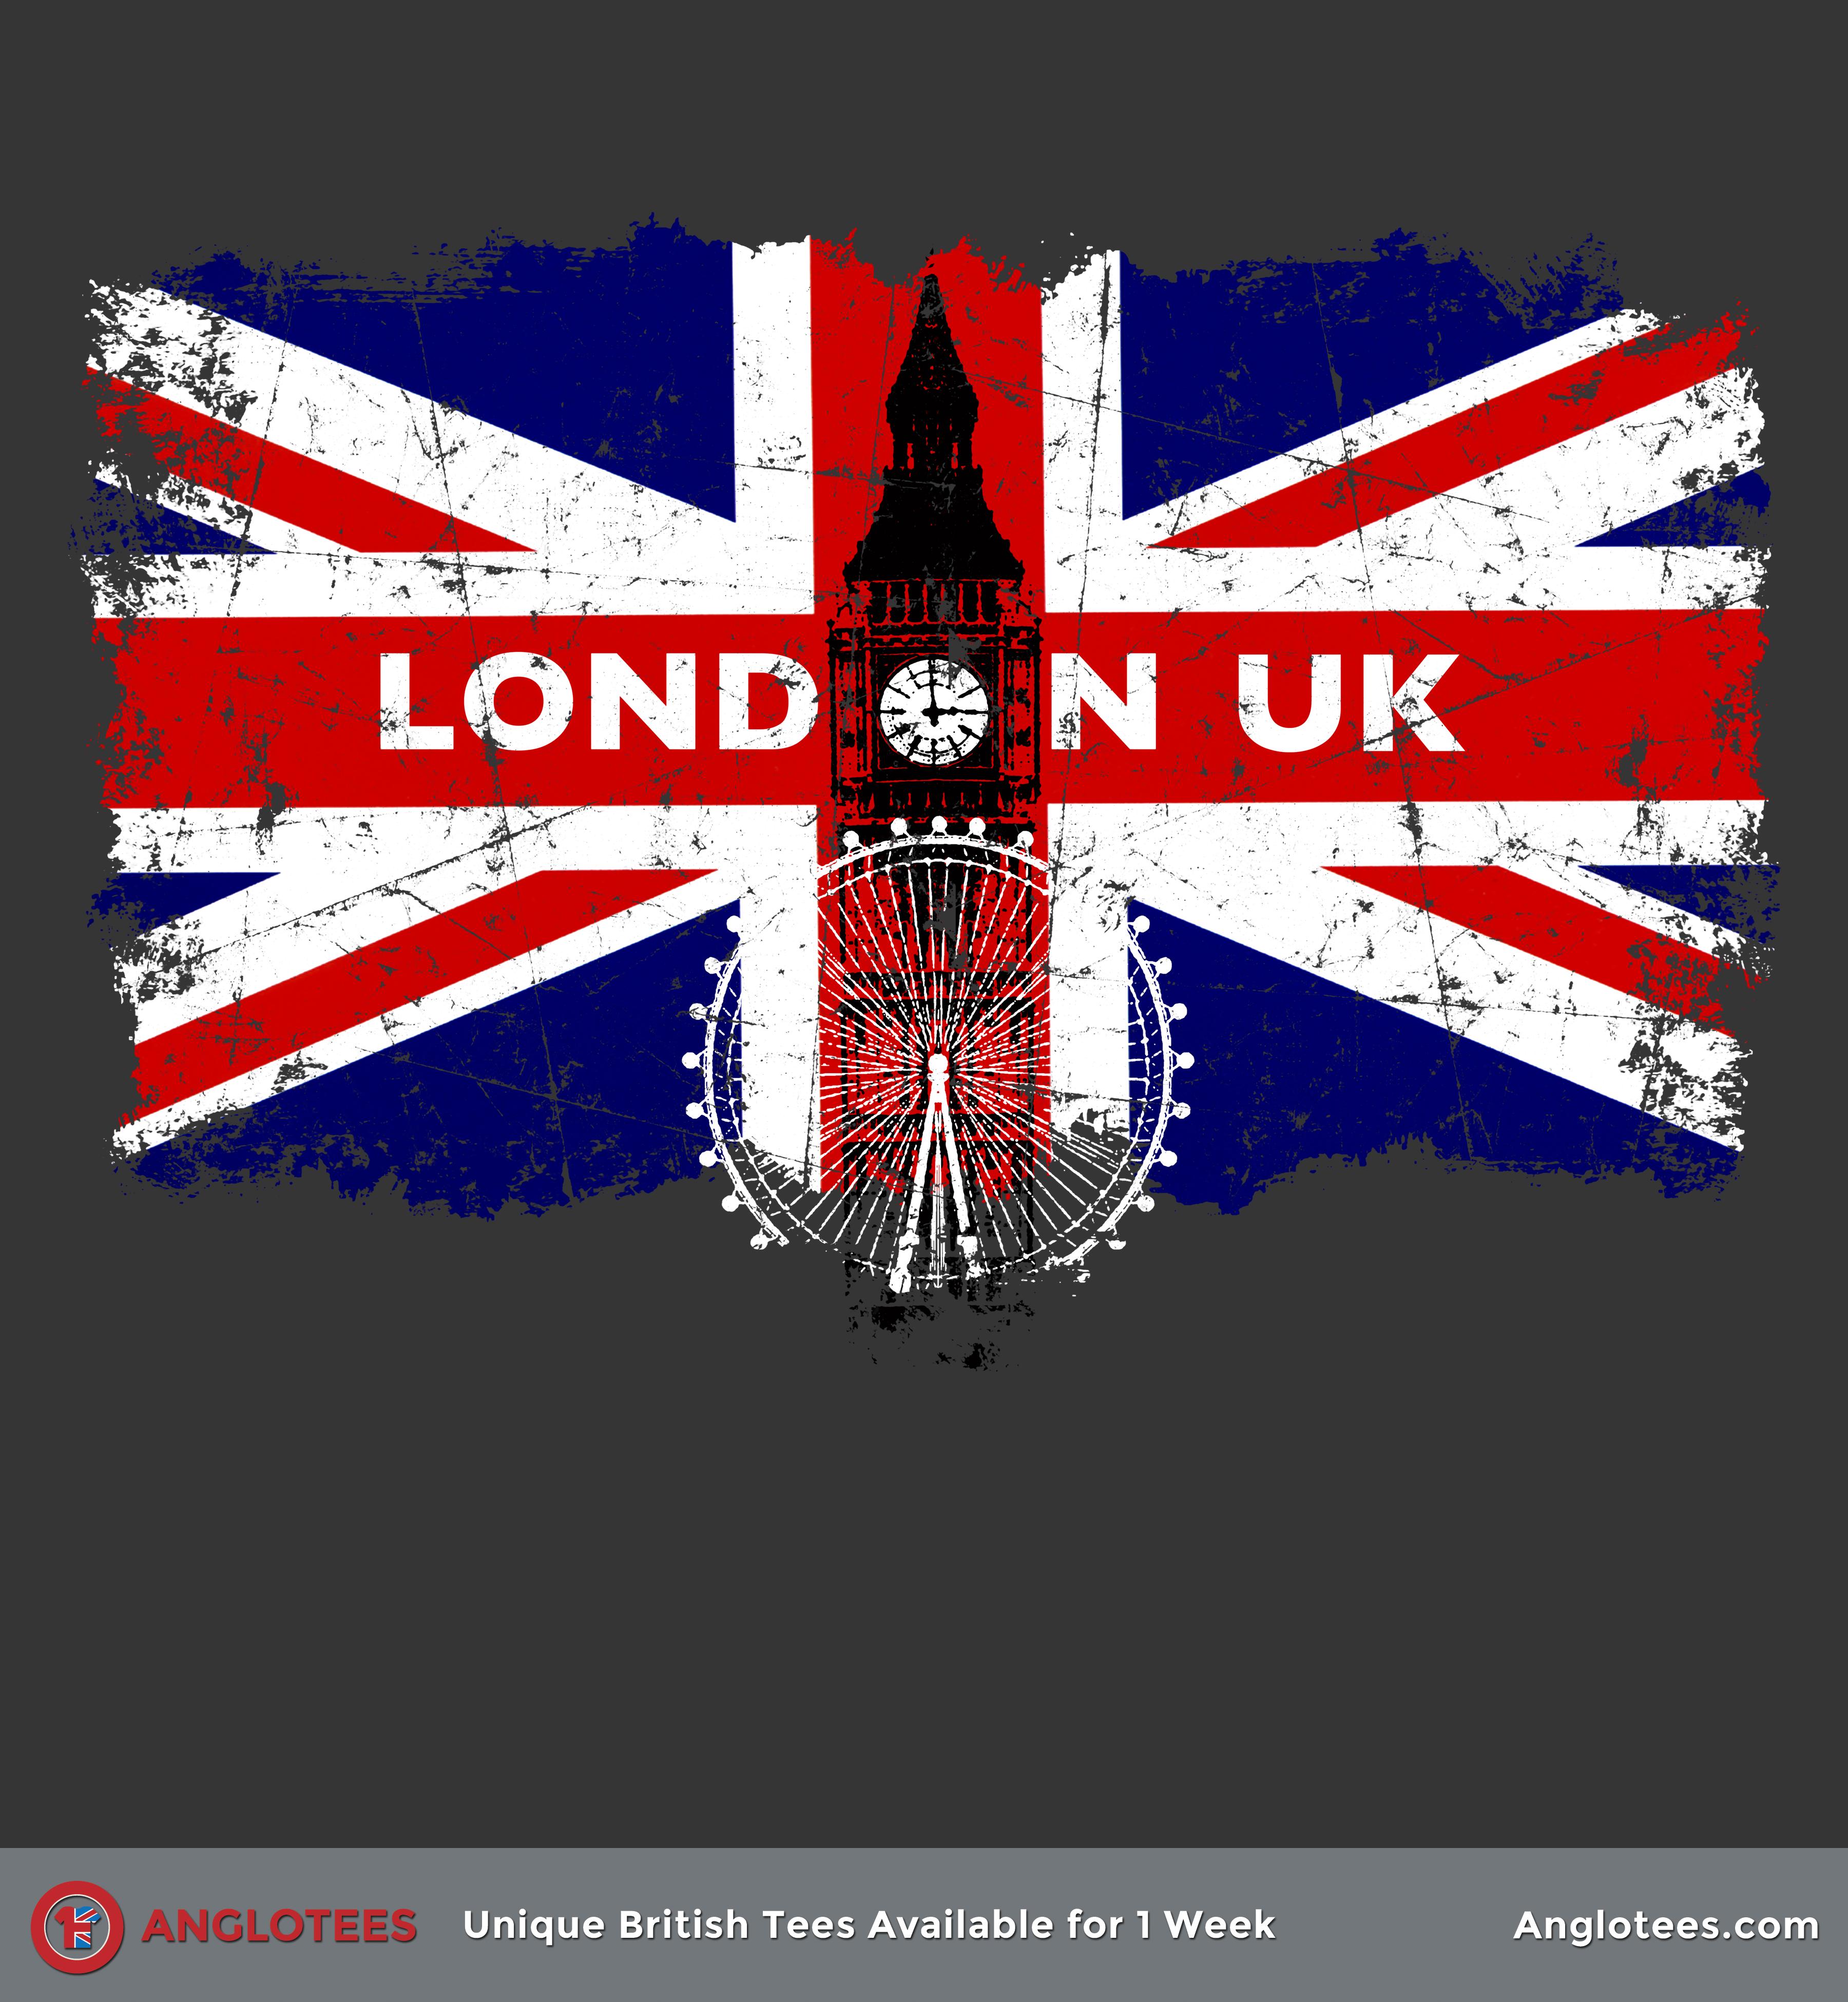 London UK - Beautiful Union Flag Tribute to London - Anglotees